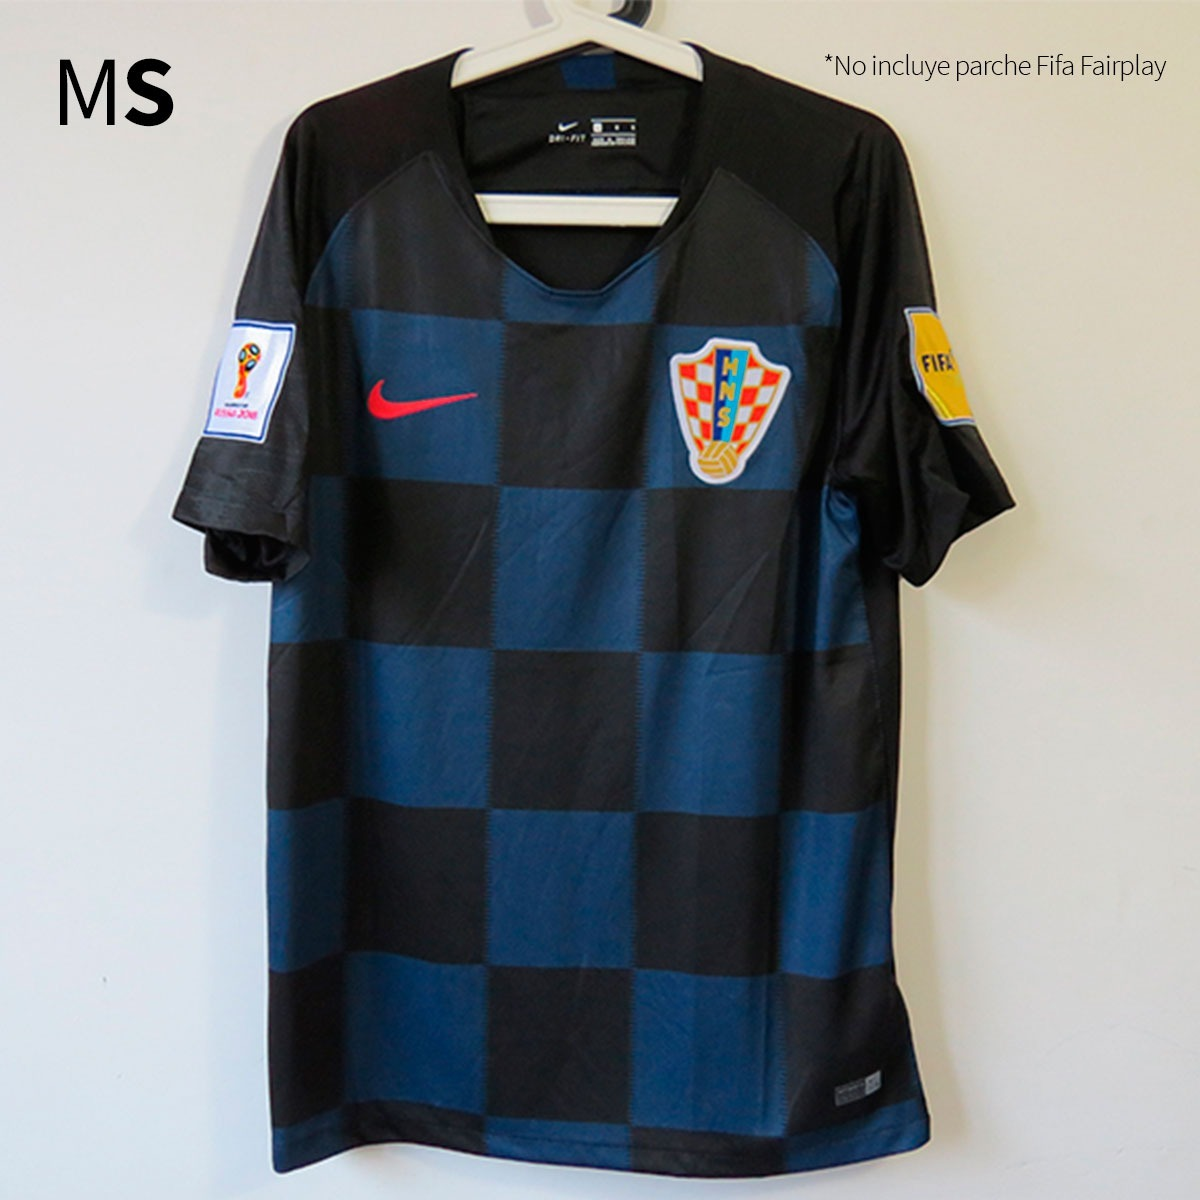 5fd7630024aee camiseta alternativa de selección croacia 2018. Cargando zoom.